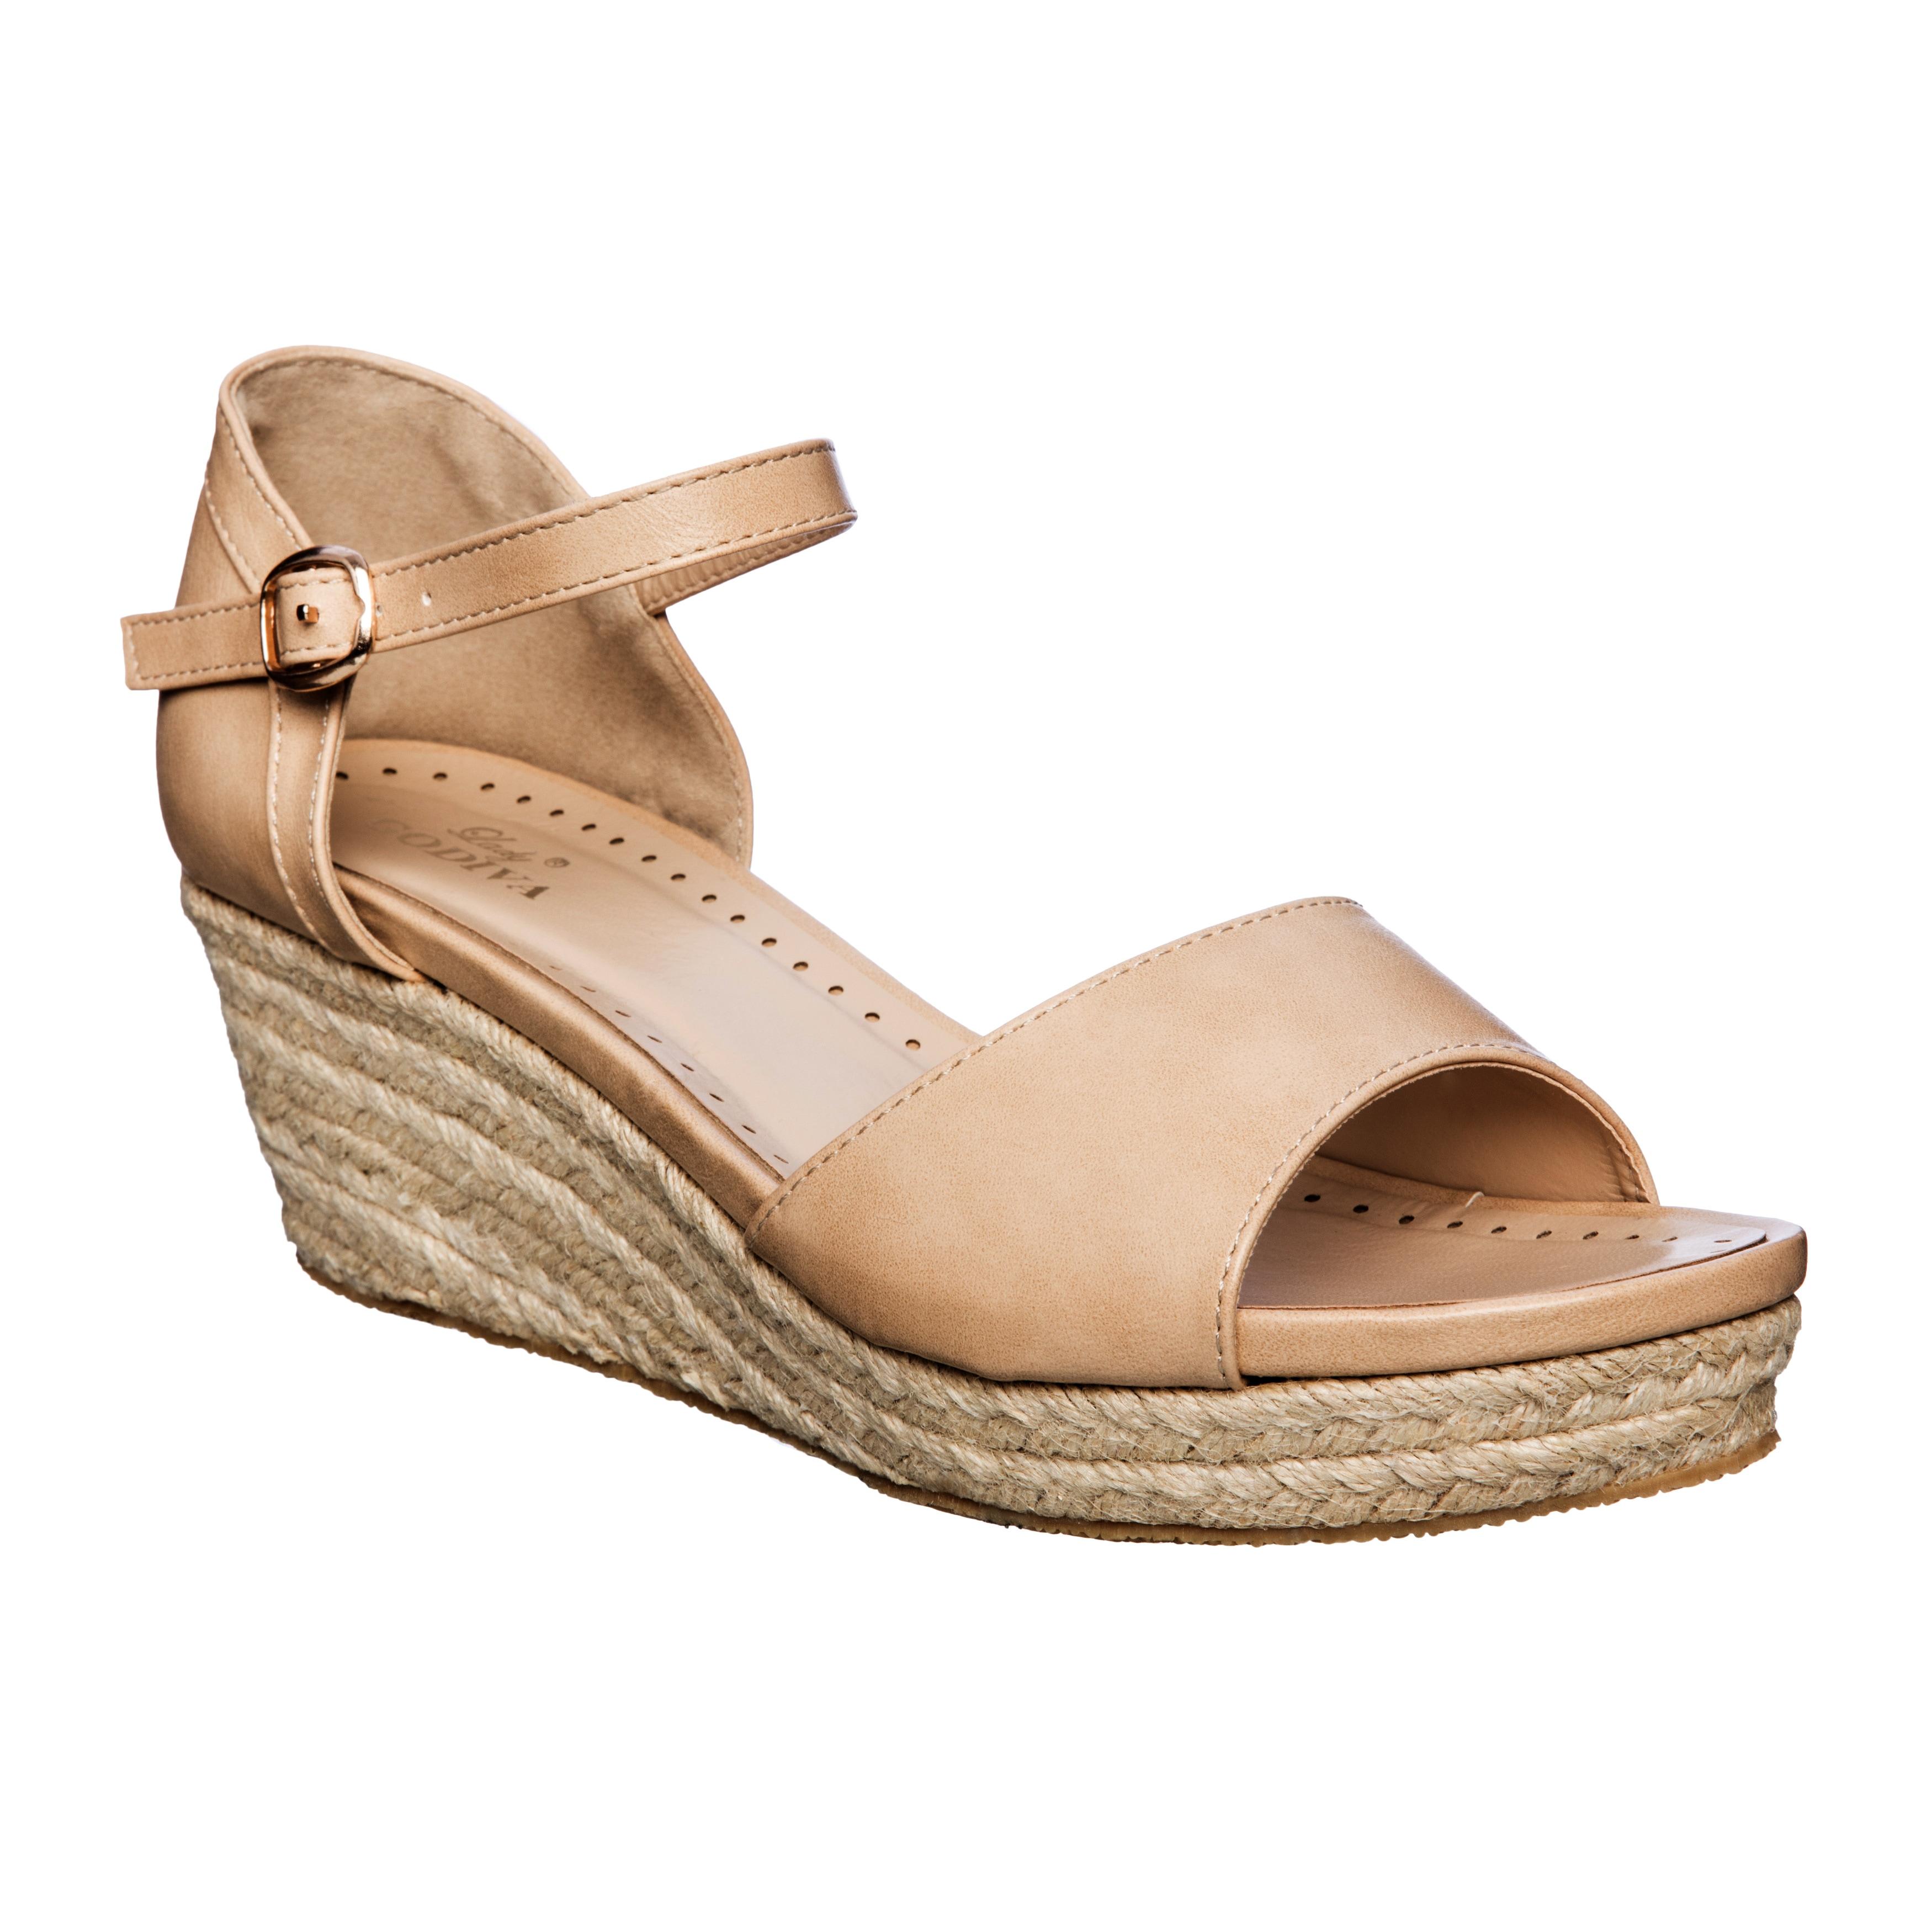 wedge solsoft best comfort pu toetos comforter wedges platform m s women reviews sandals in pcr helpful us mid nude heel rated customer